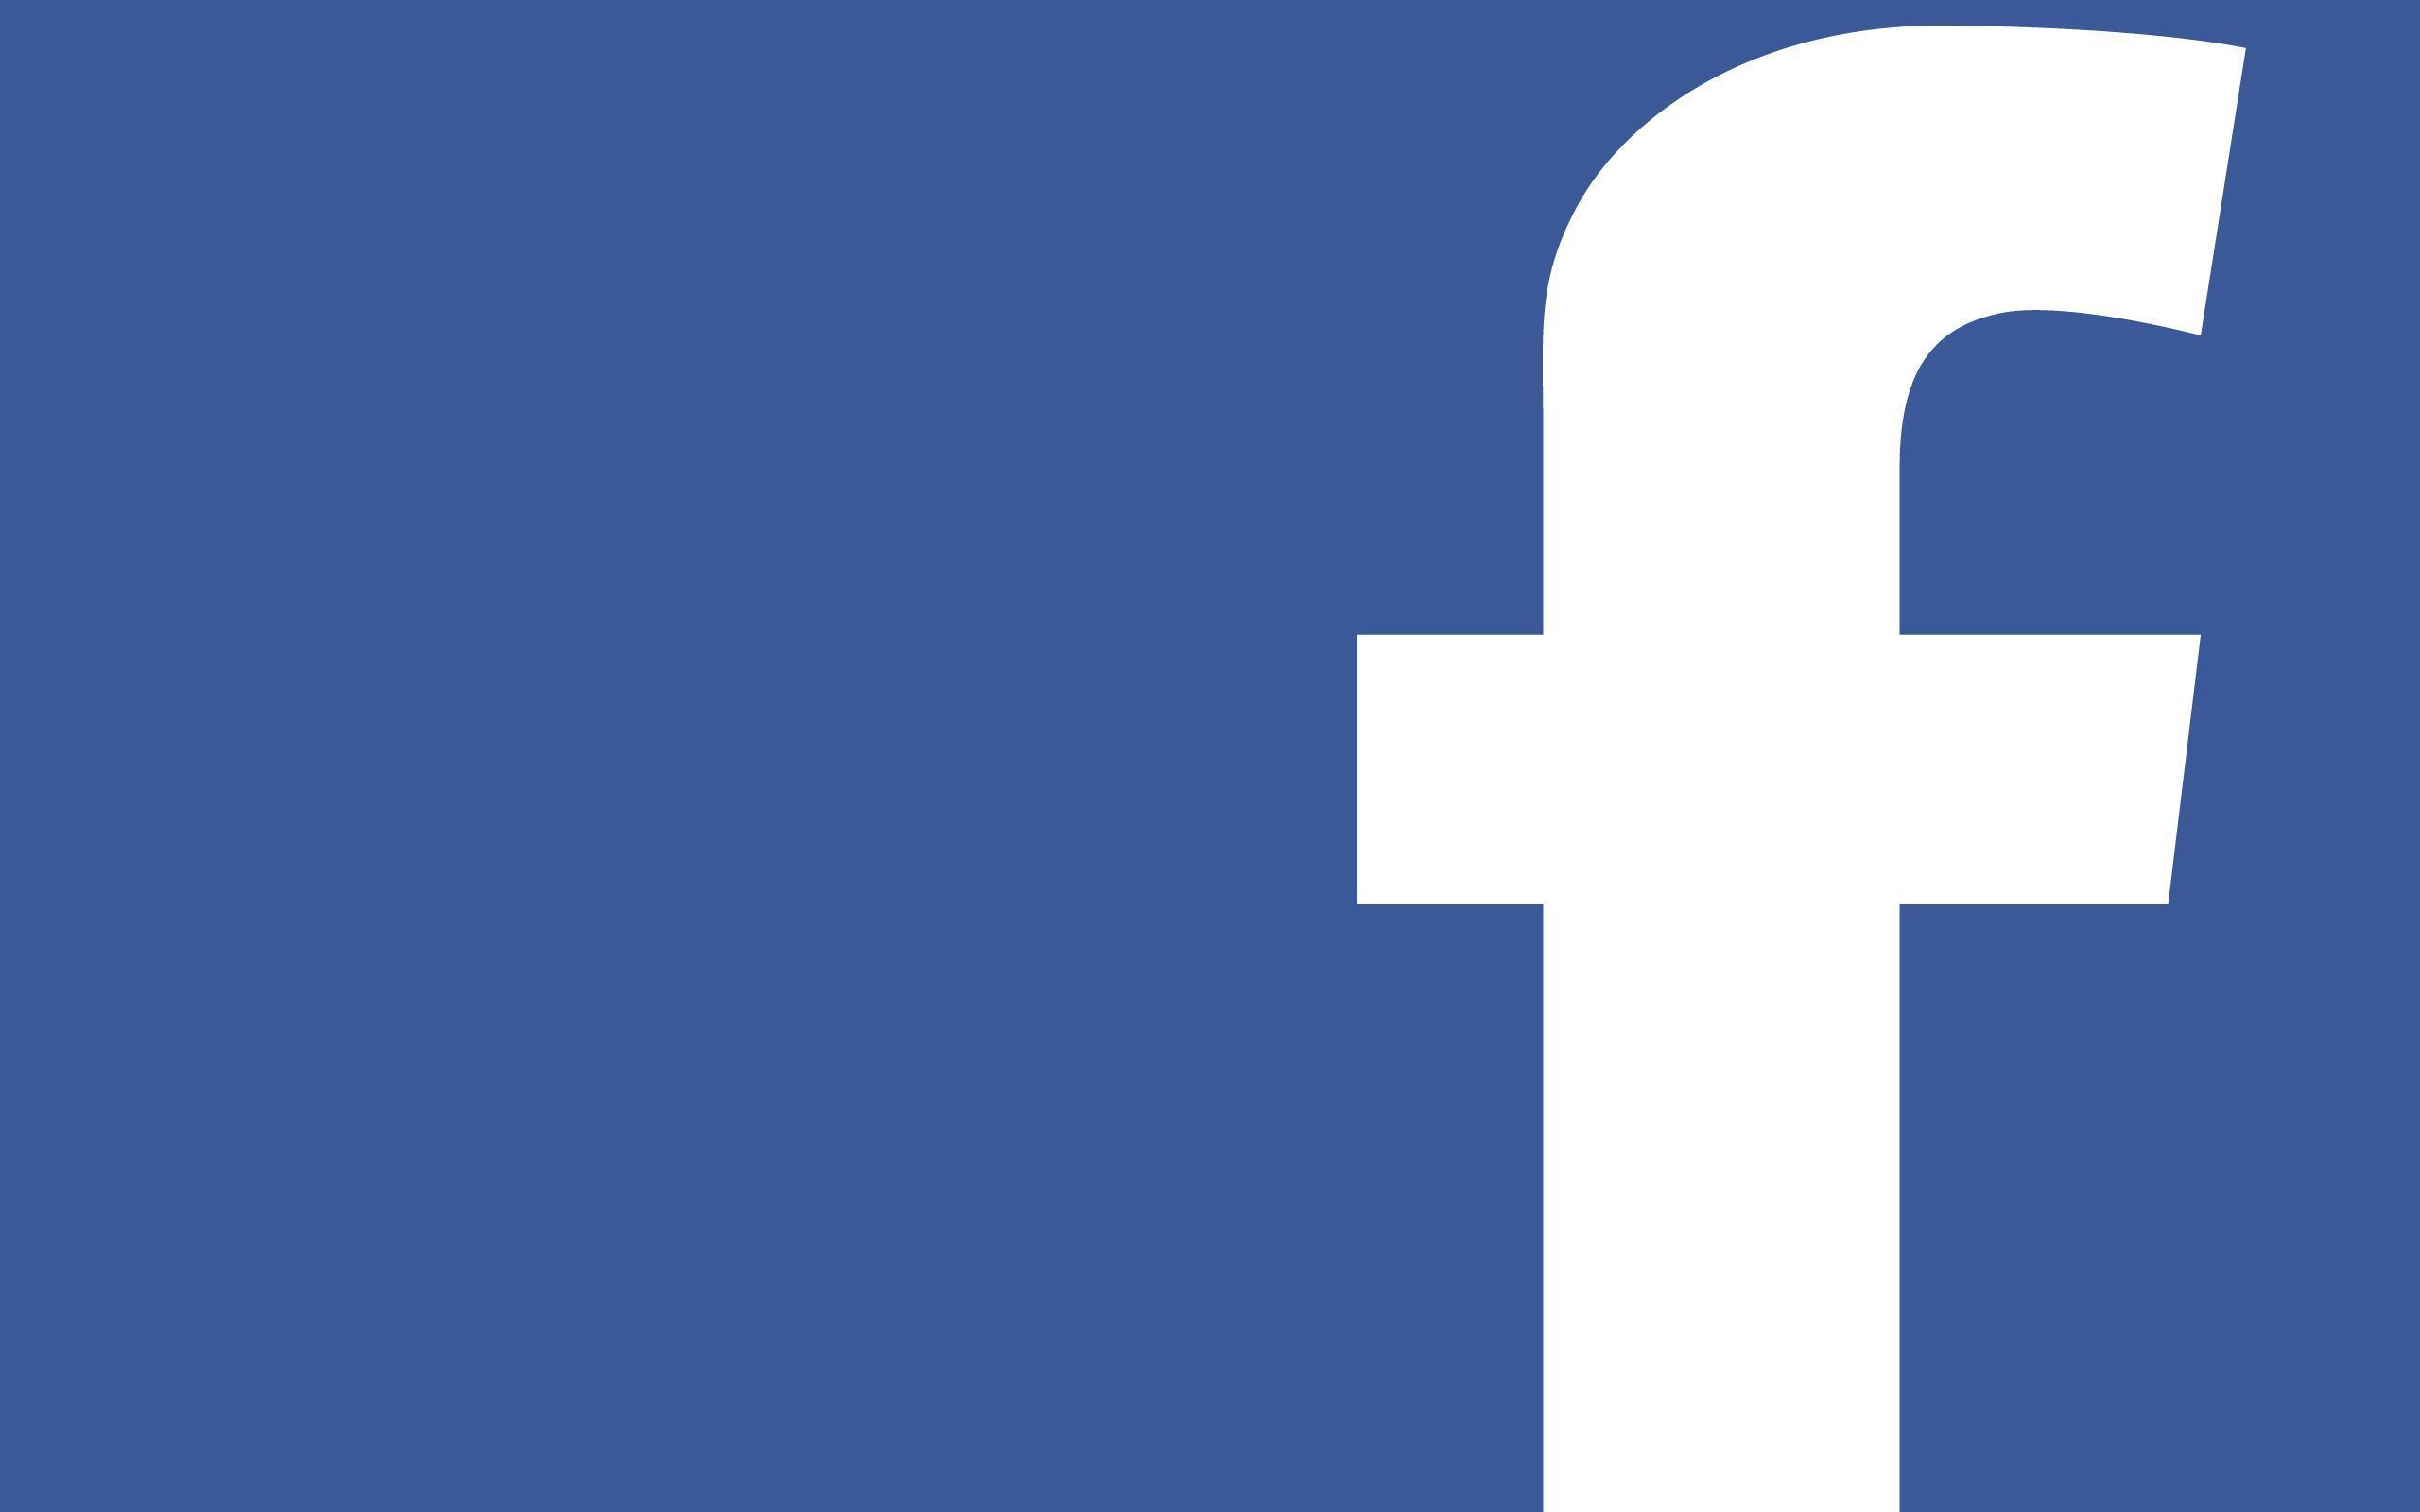 Wallpaper Facebook